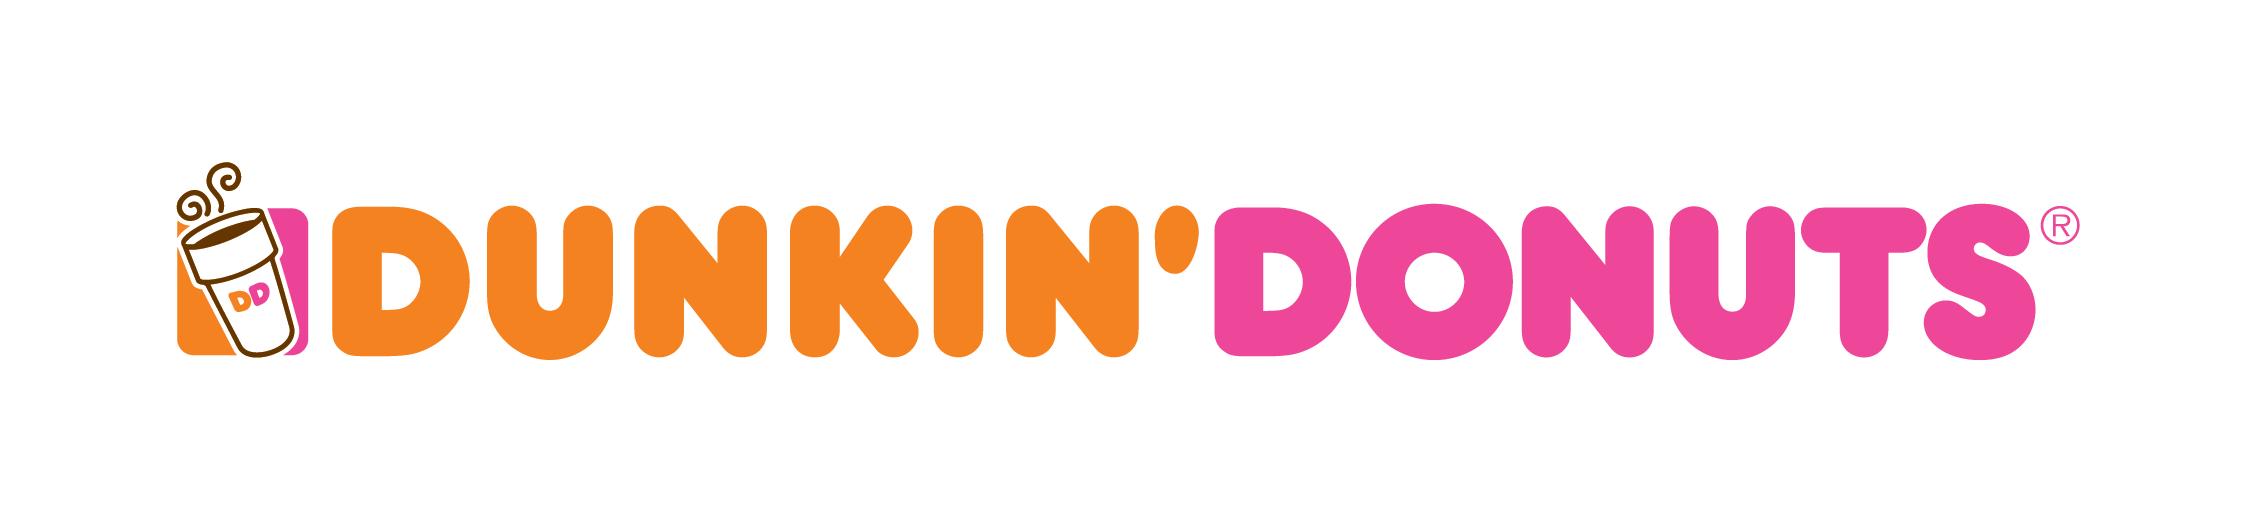 world dunkin donuts png logo #3123